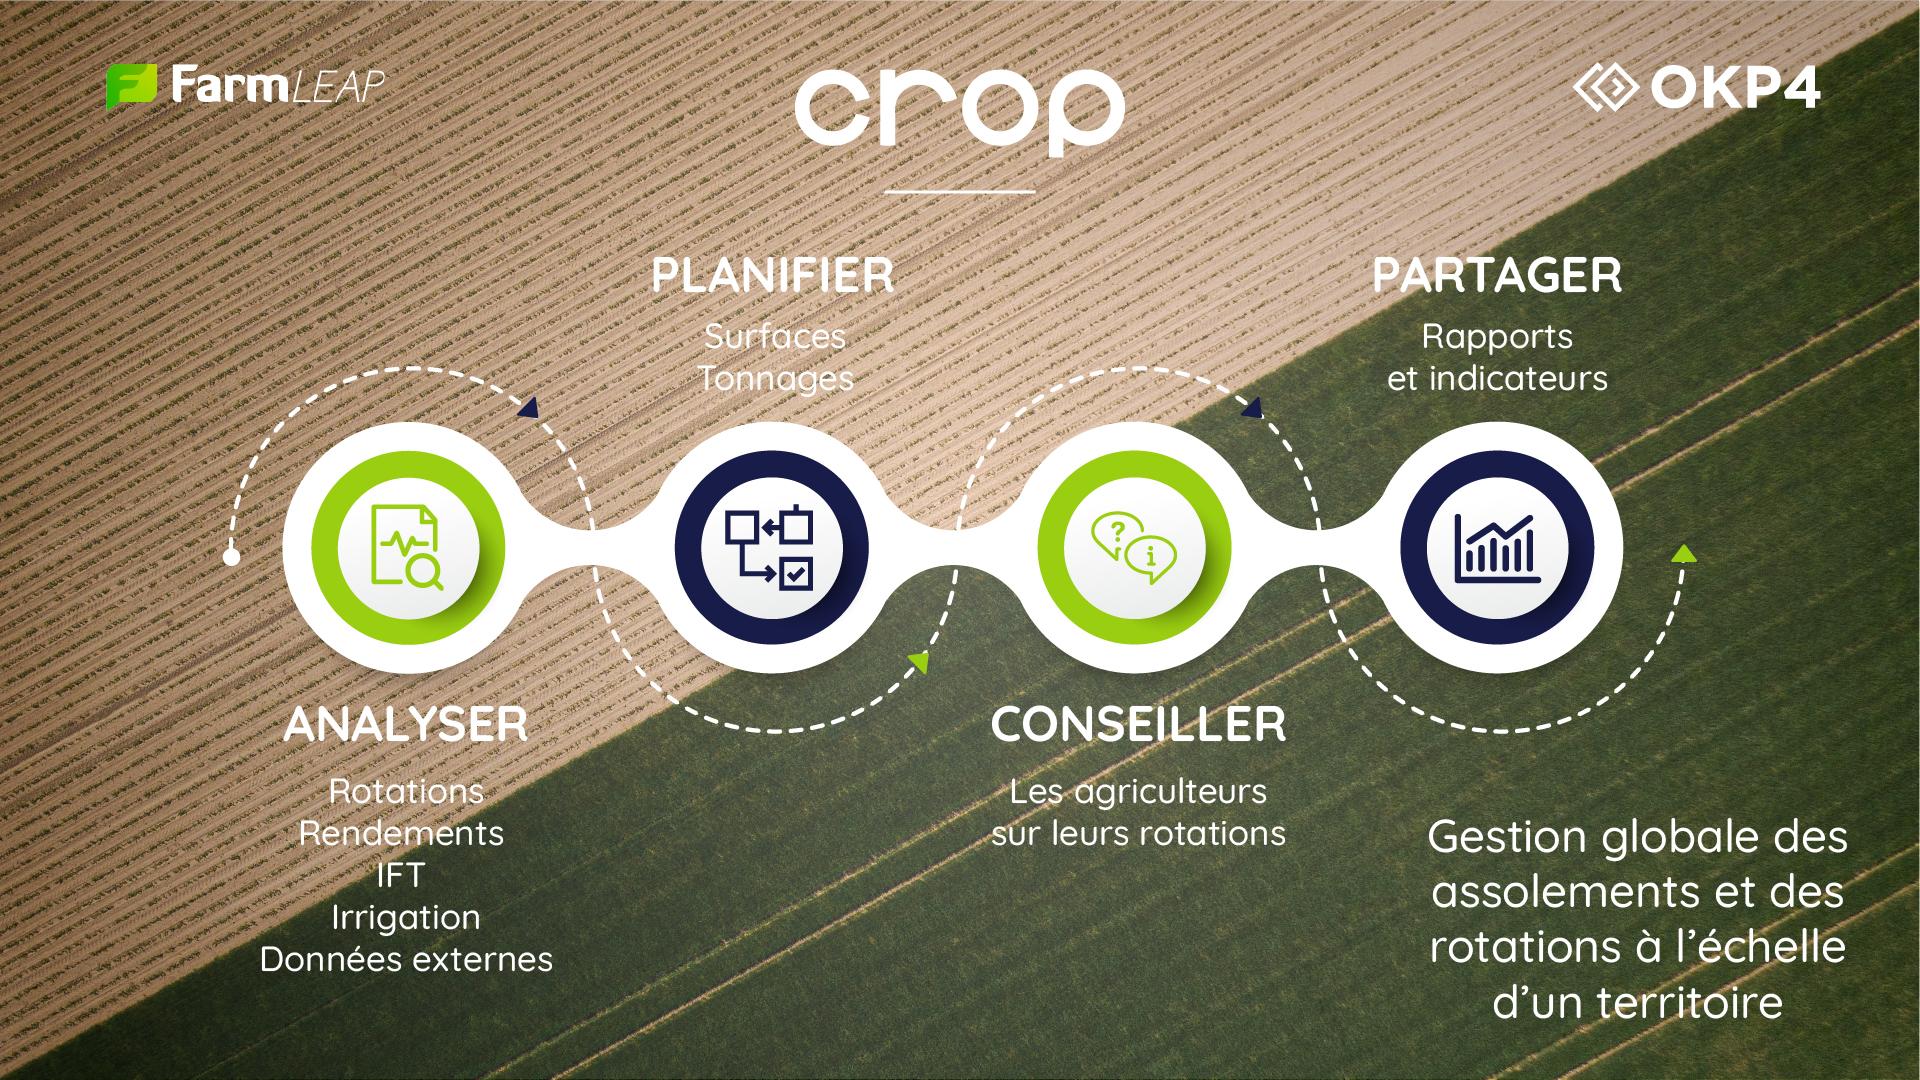 CROP rotation description OKP4 Farmleap